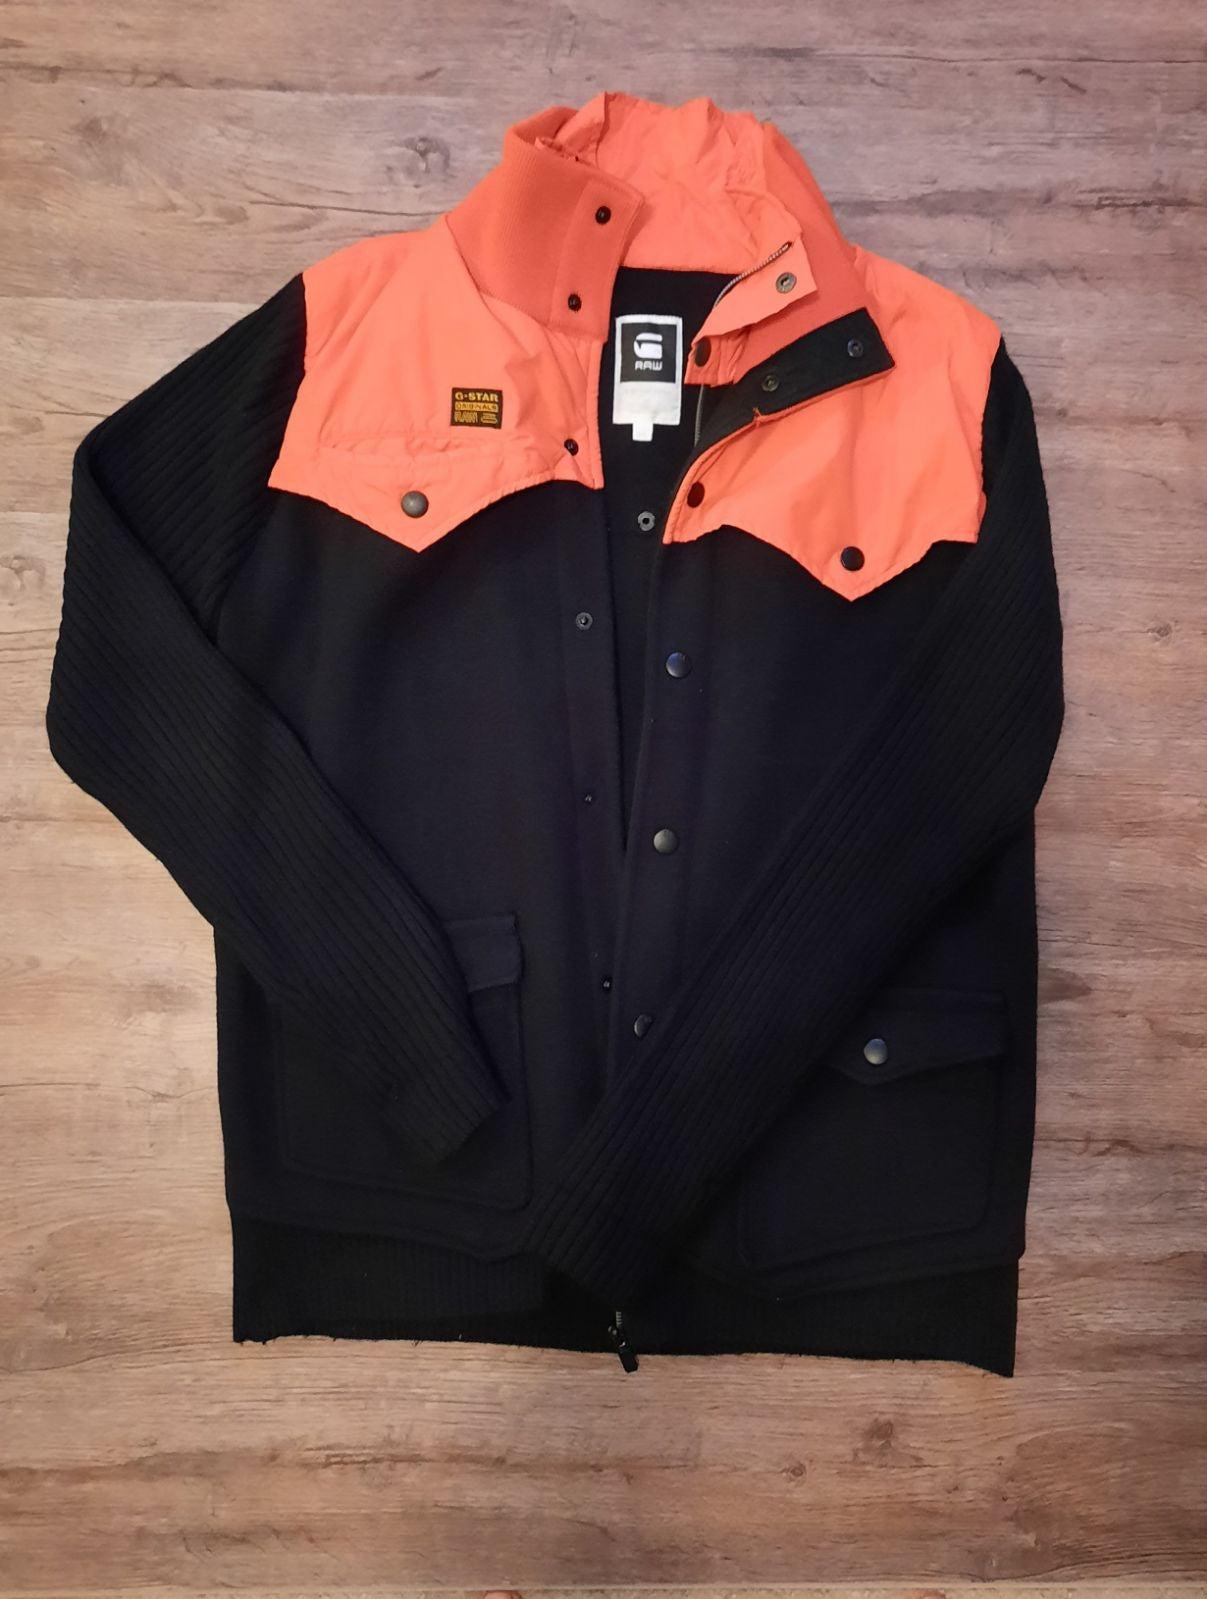 G star raw tech sweater jacket